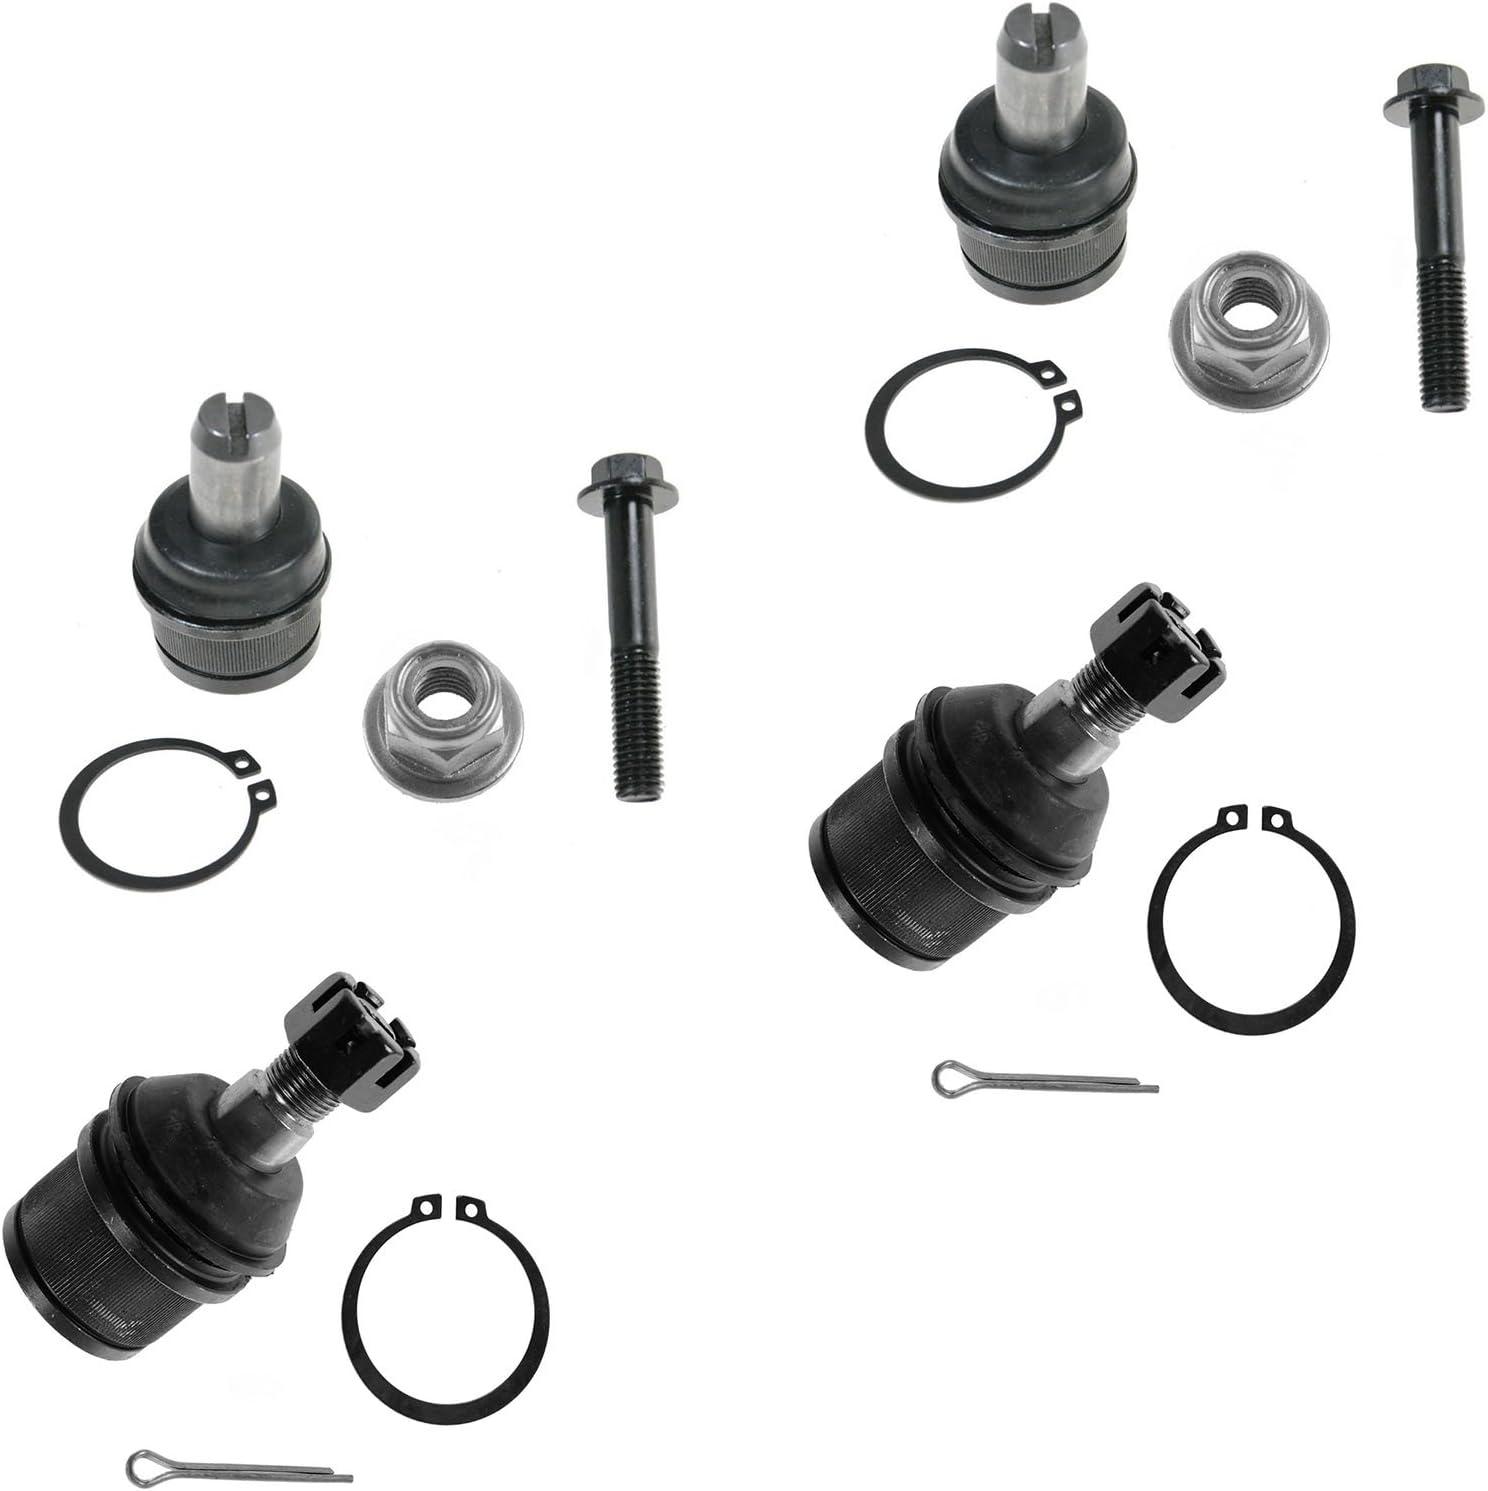 LIFETIME Upper /& Lower 4 Ball Joint Kit for Ford F250 F350 Super Duty 84-97